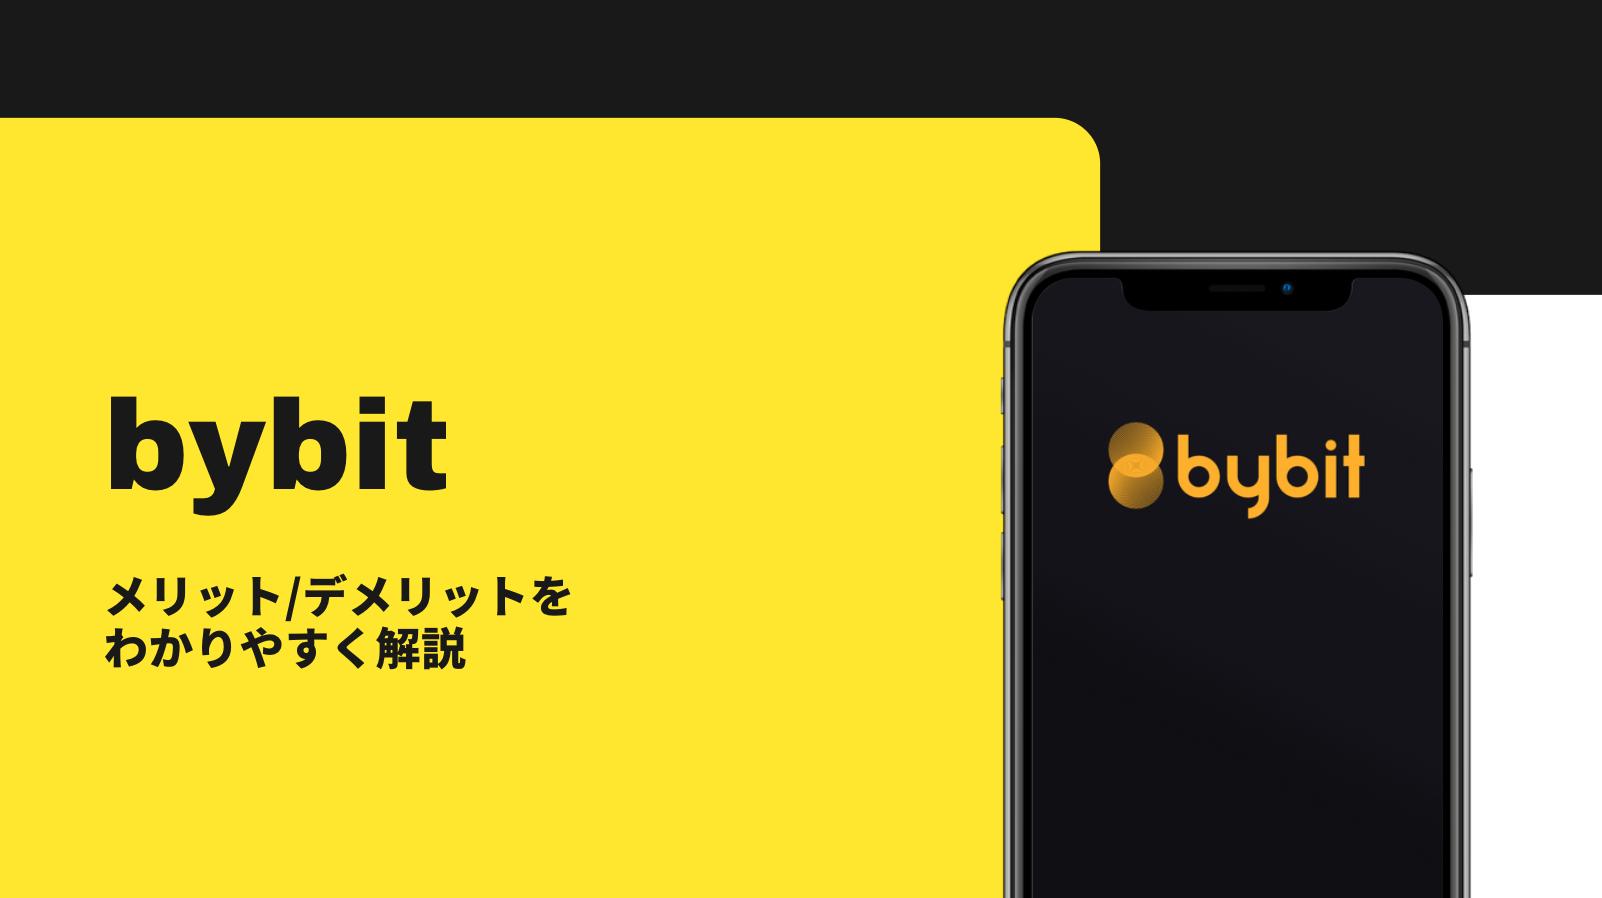 bybit(バイビット)の特徴・メリット・デメリットを徹底解説!